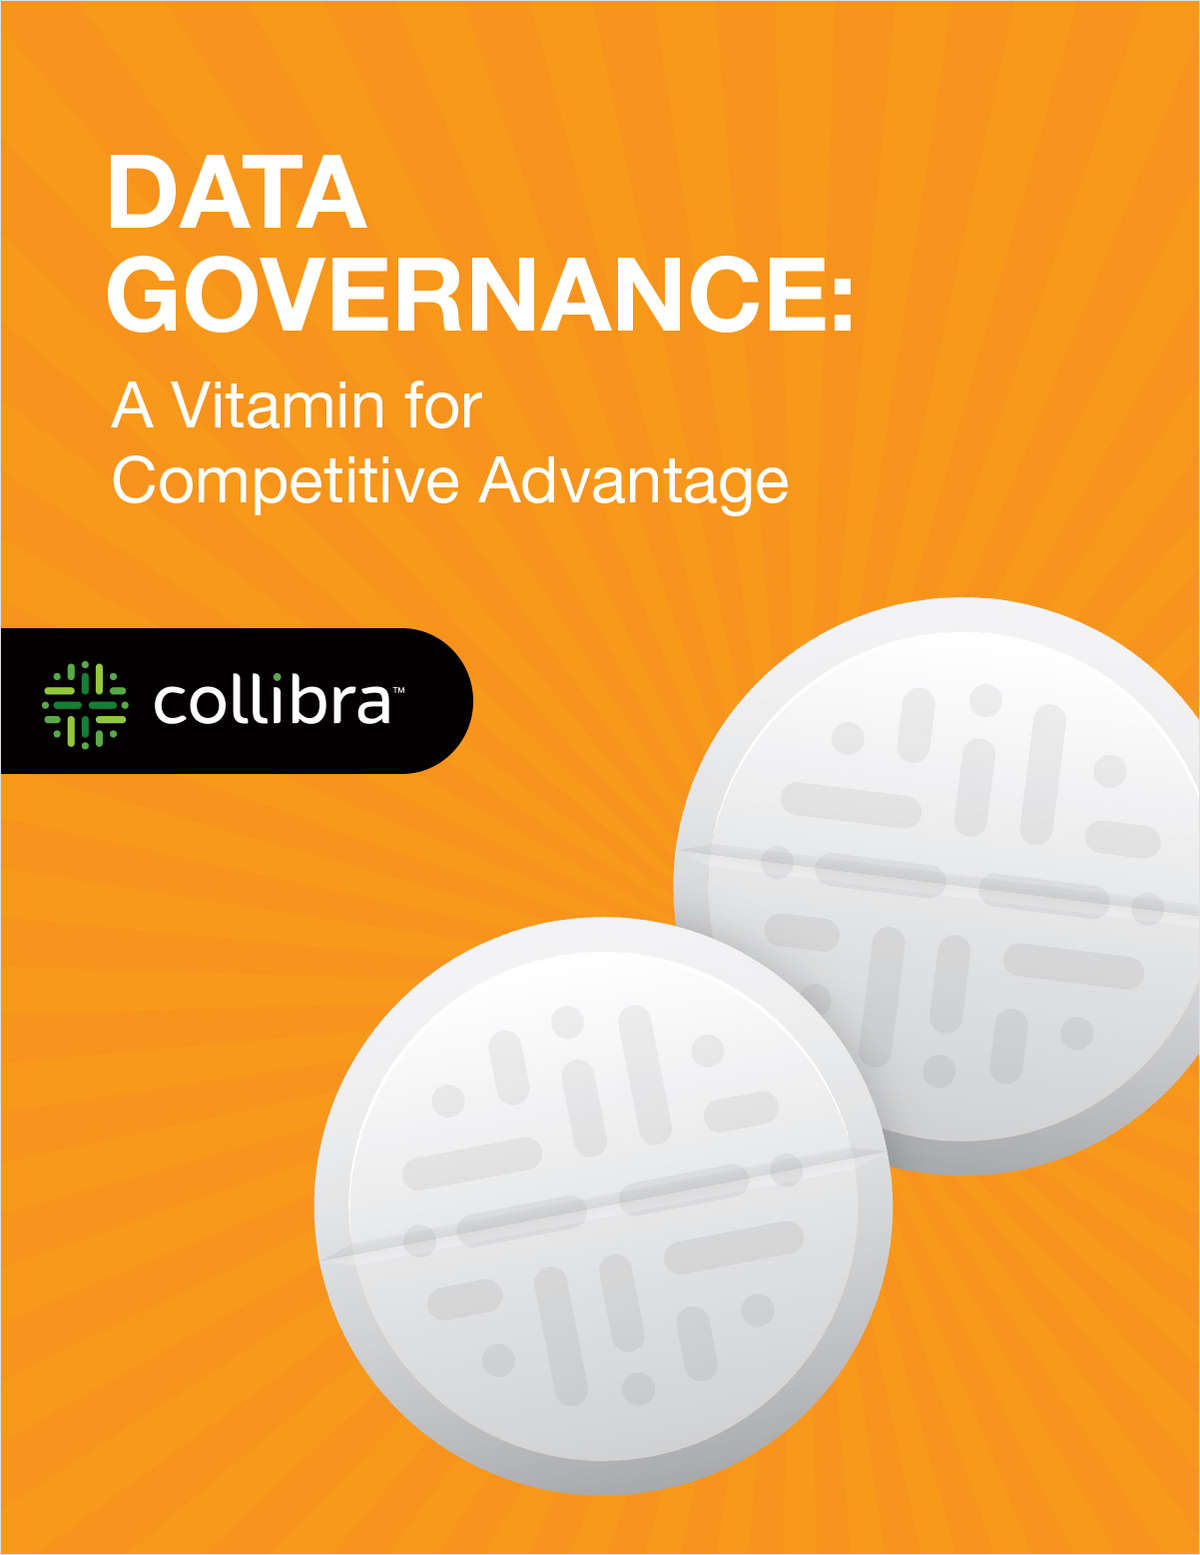 Data Governance: A Vitamin for Competitive Advantage